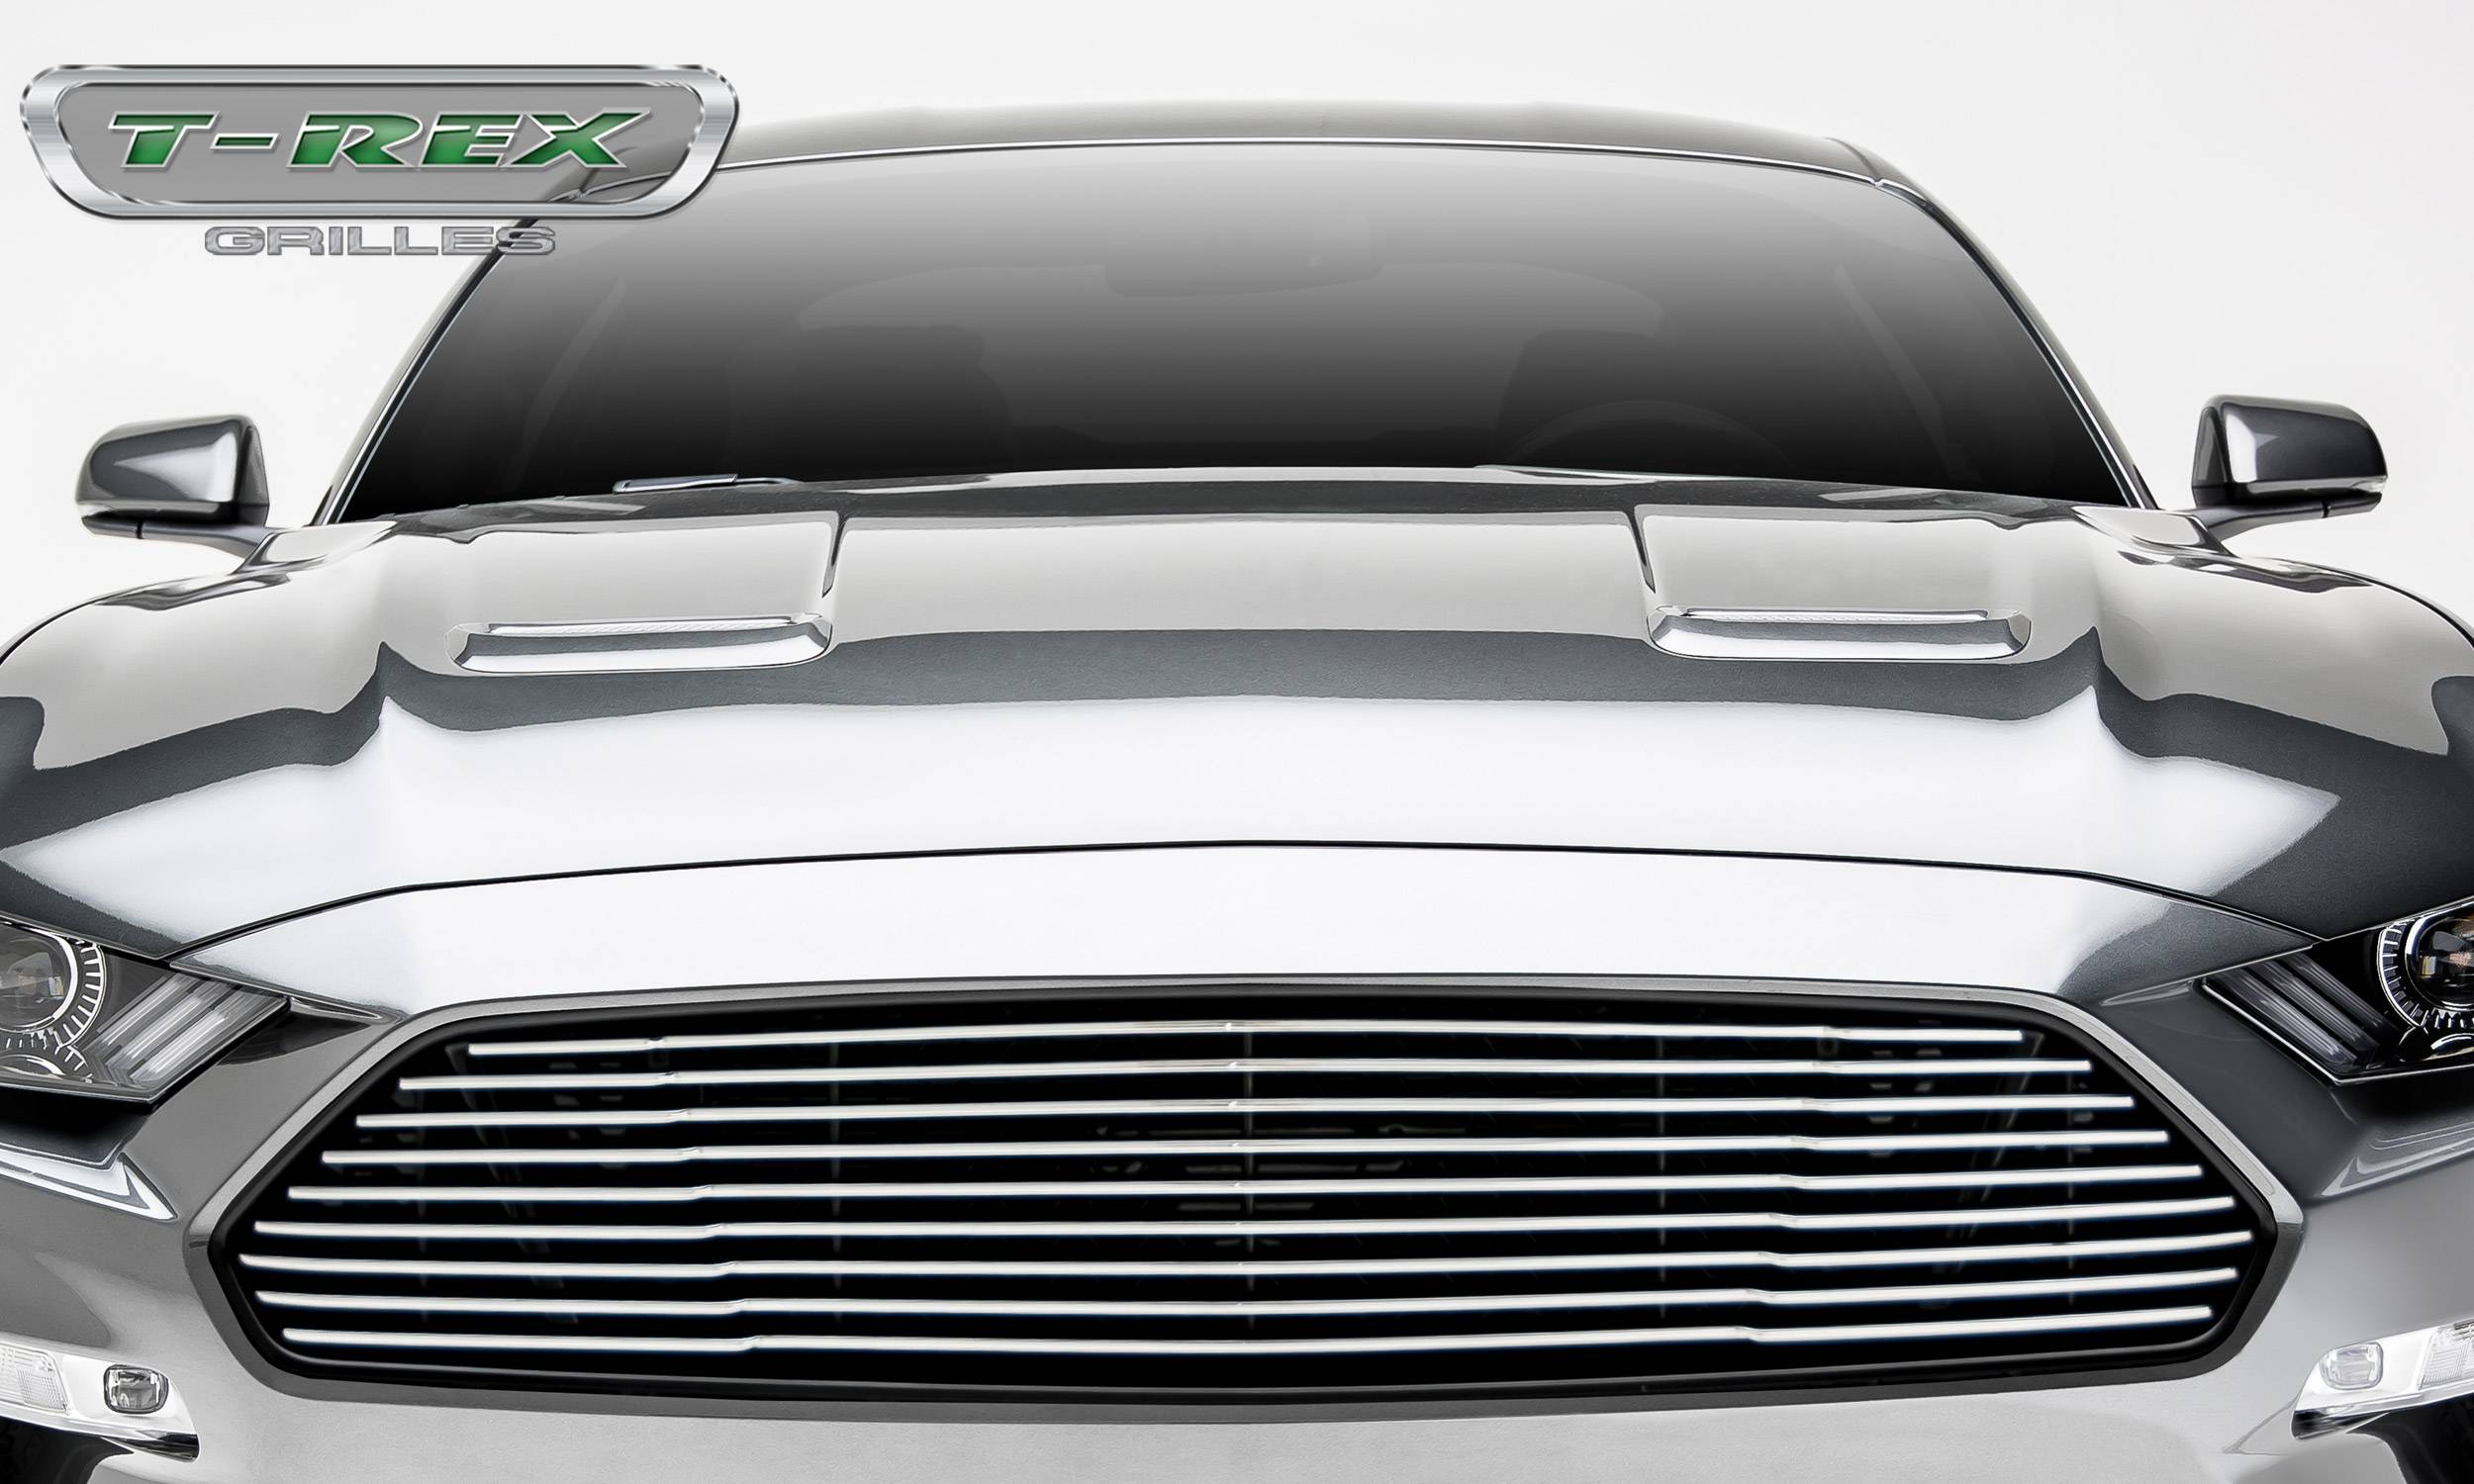 T Rex Car For Sale >> 2018-2019 Mustang GT Billet Series Main Grille Insert ...